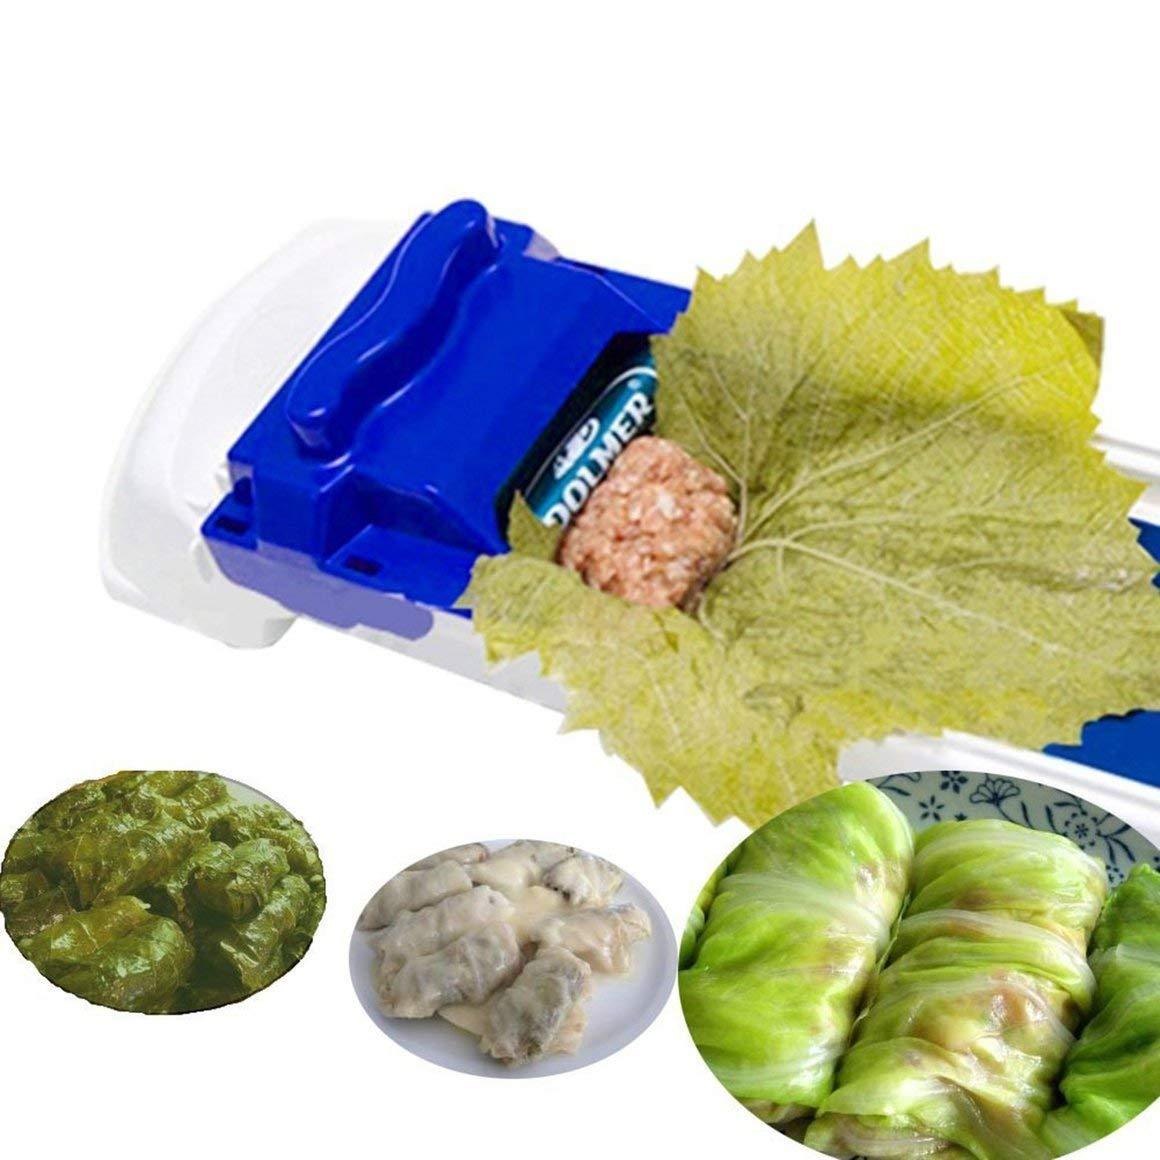 Funnyrunstore Vegetable Meat Rolling Tool Roll Sushi Maker Rolling Cookware Tool Innovadora Cocina Vegetal Roller Machine Blanco y Azul